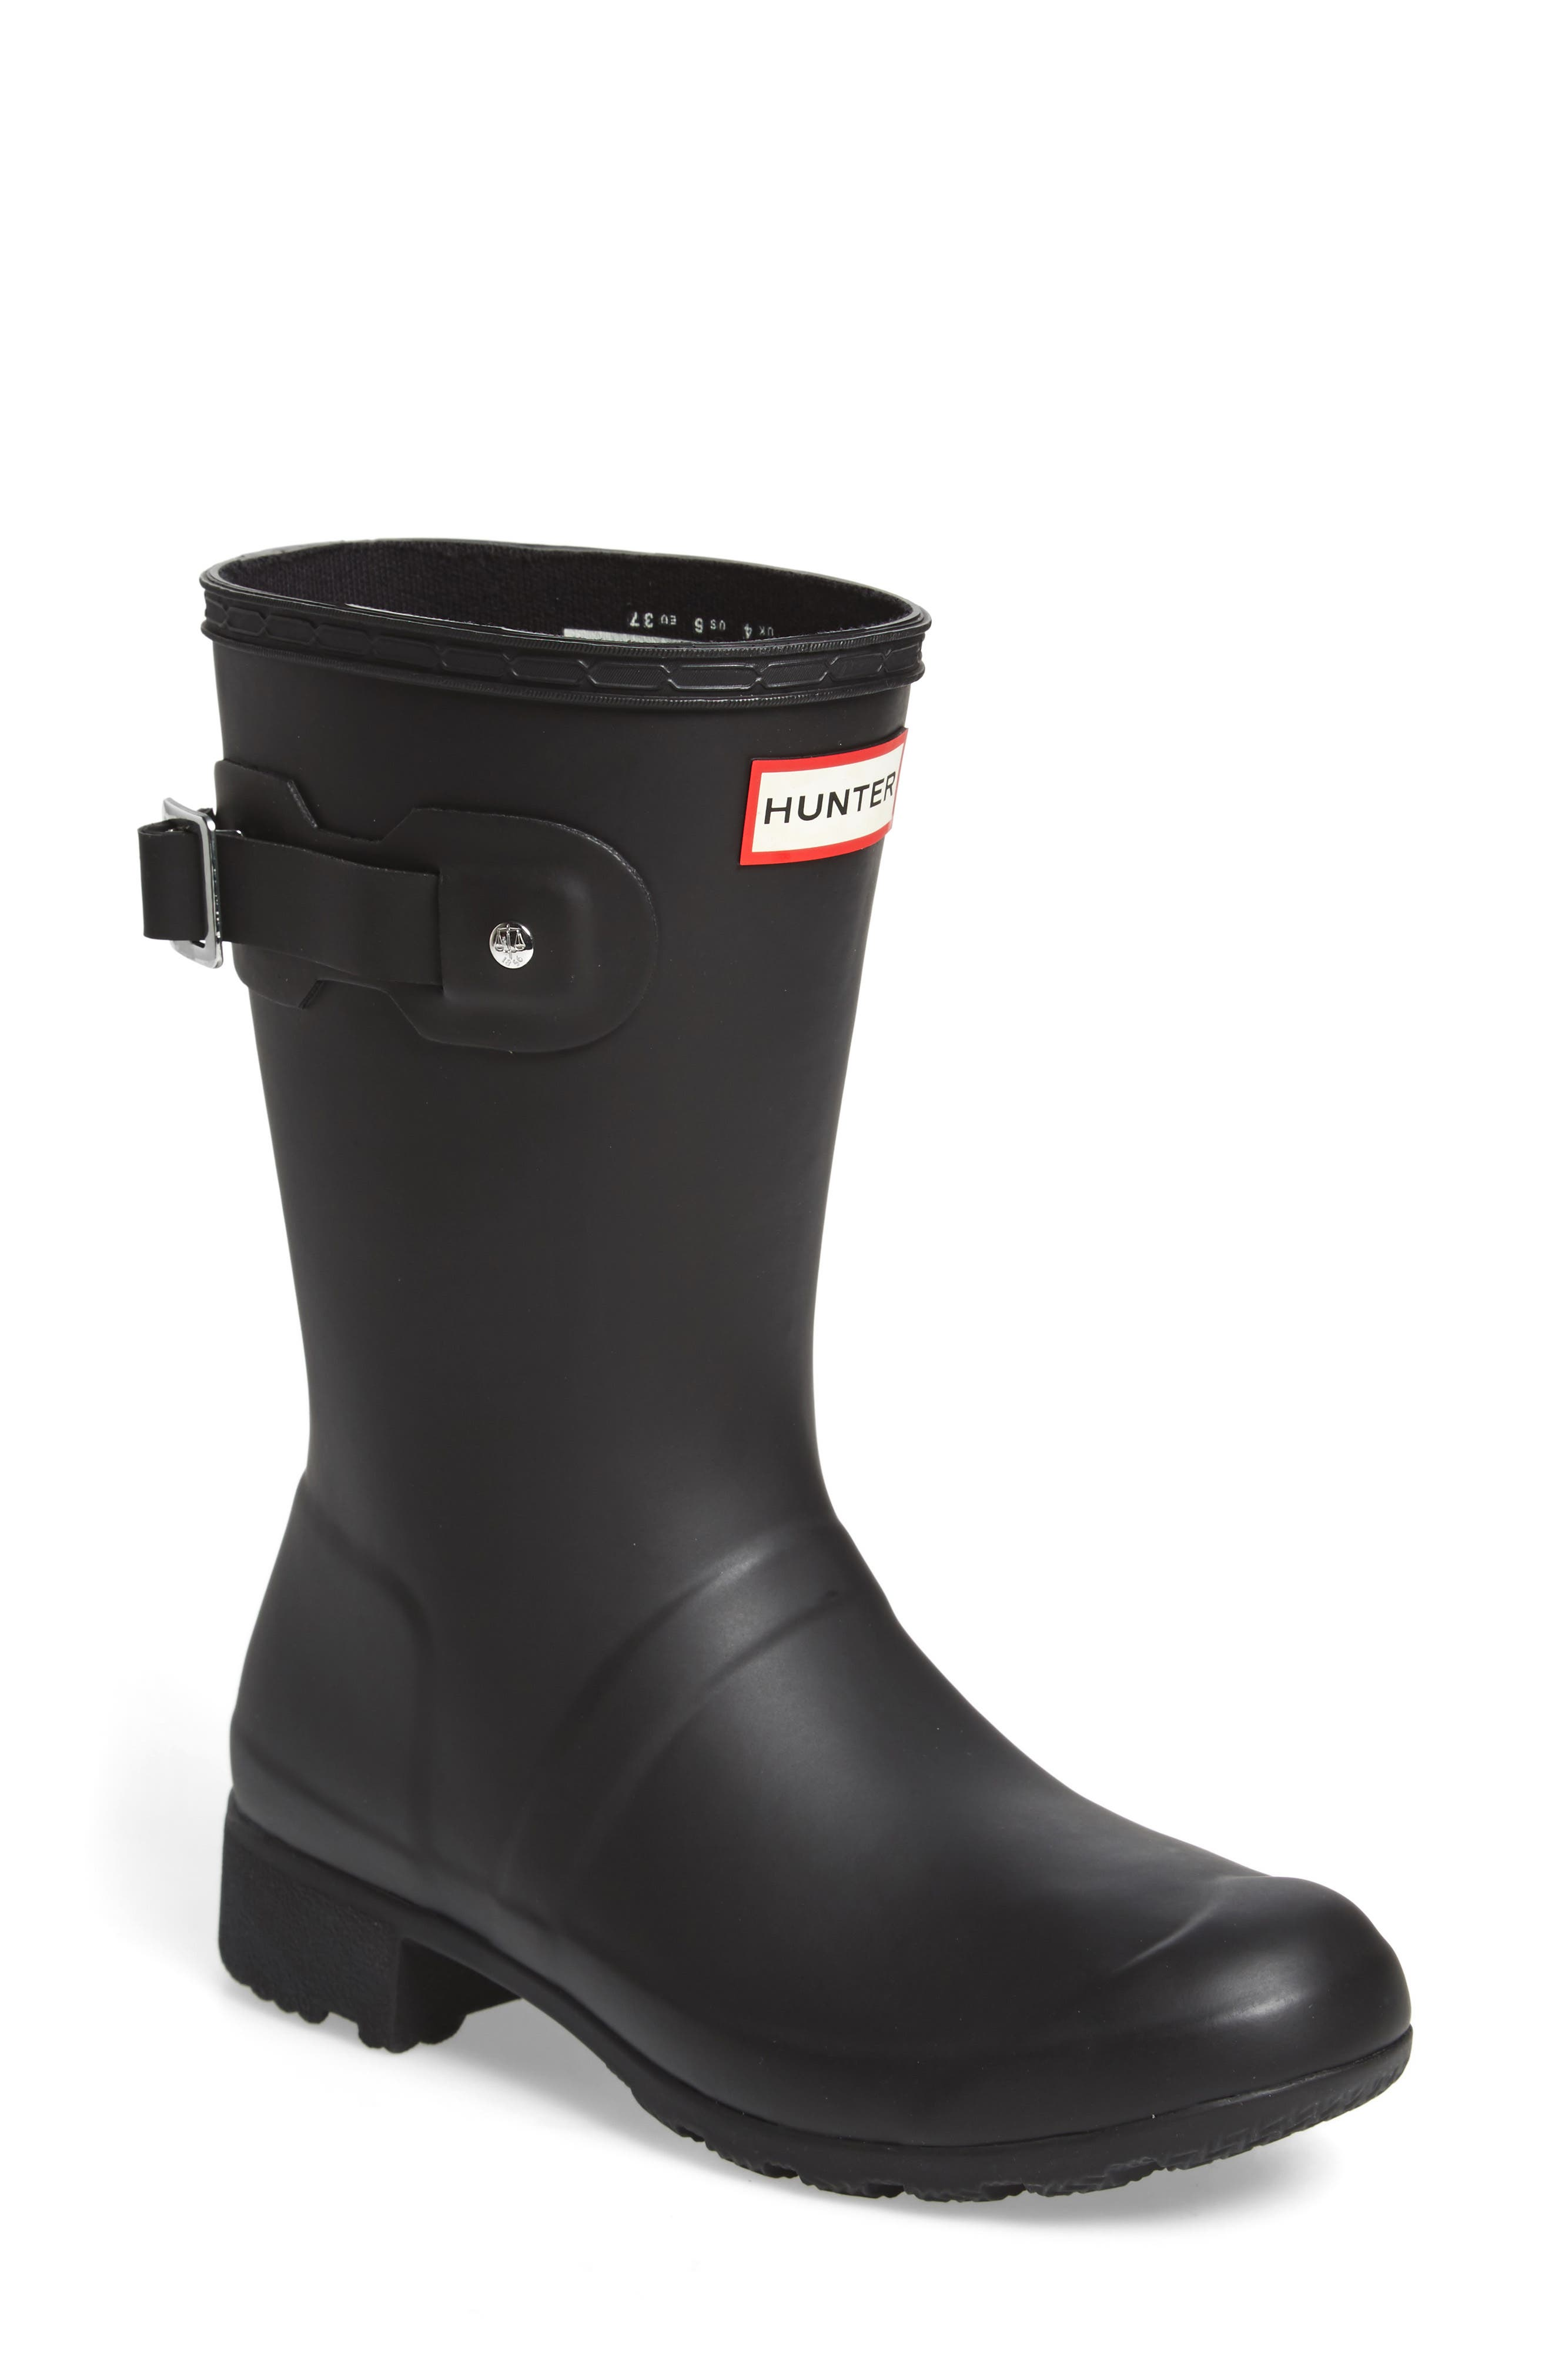 Hunter Original Tour Short Packable Rain Boot, Black